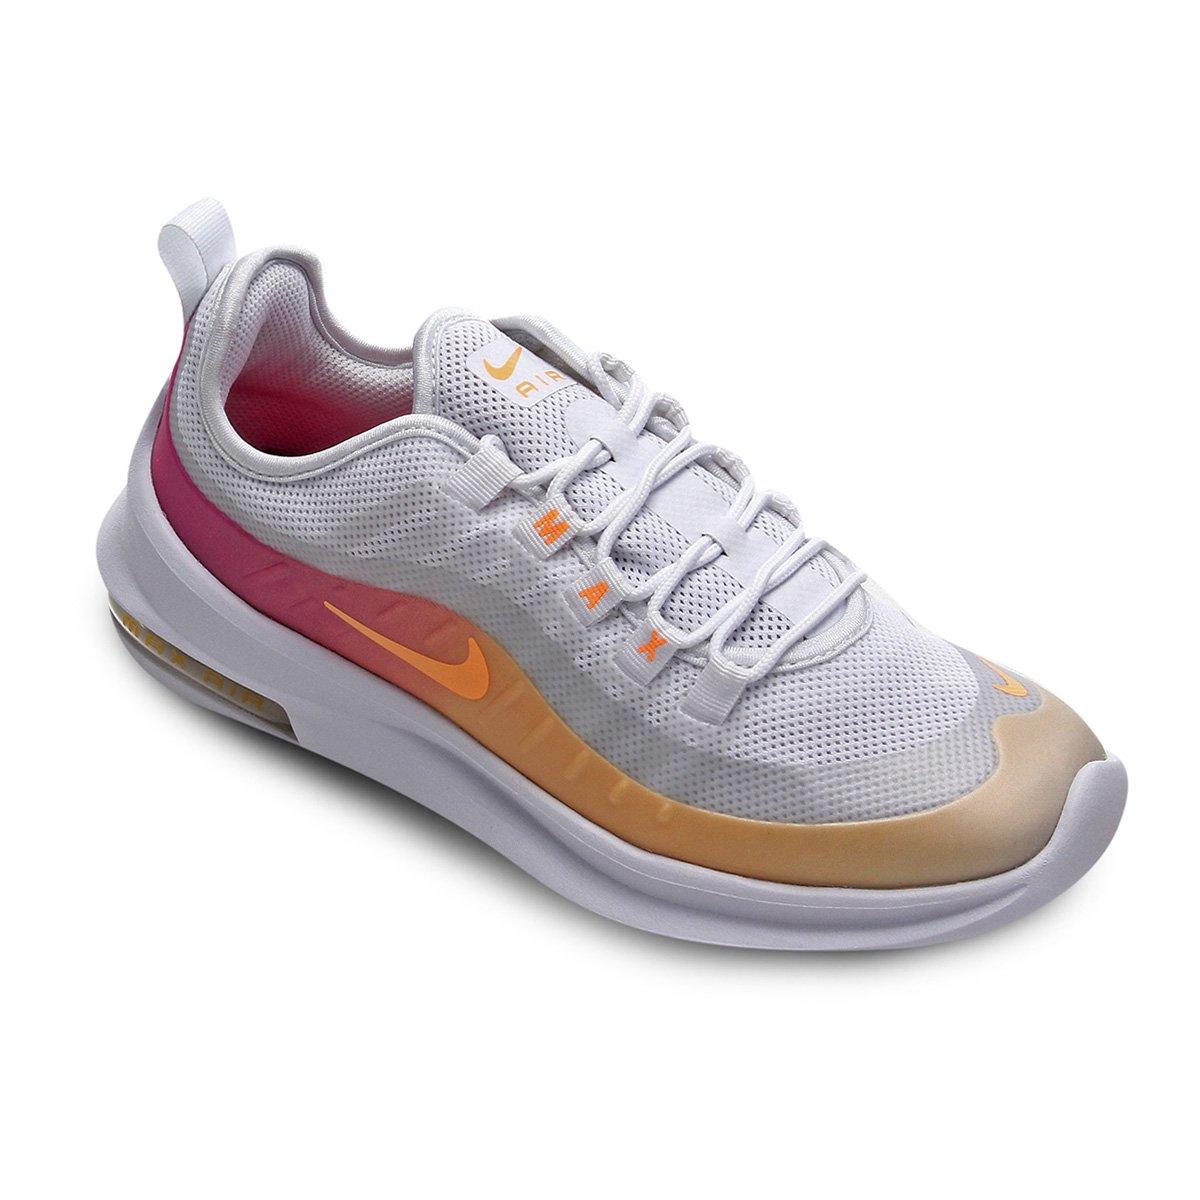 Tênis Nike Air Max Axis Prem Feminino Branco E Laranja